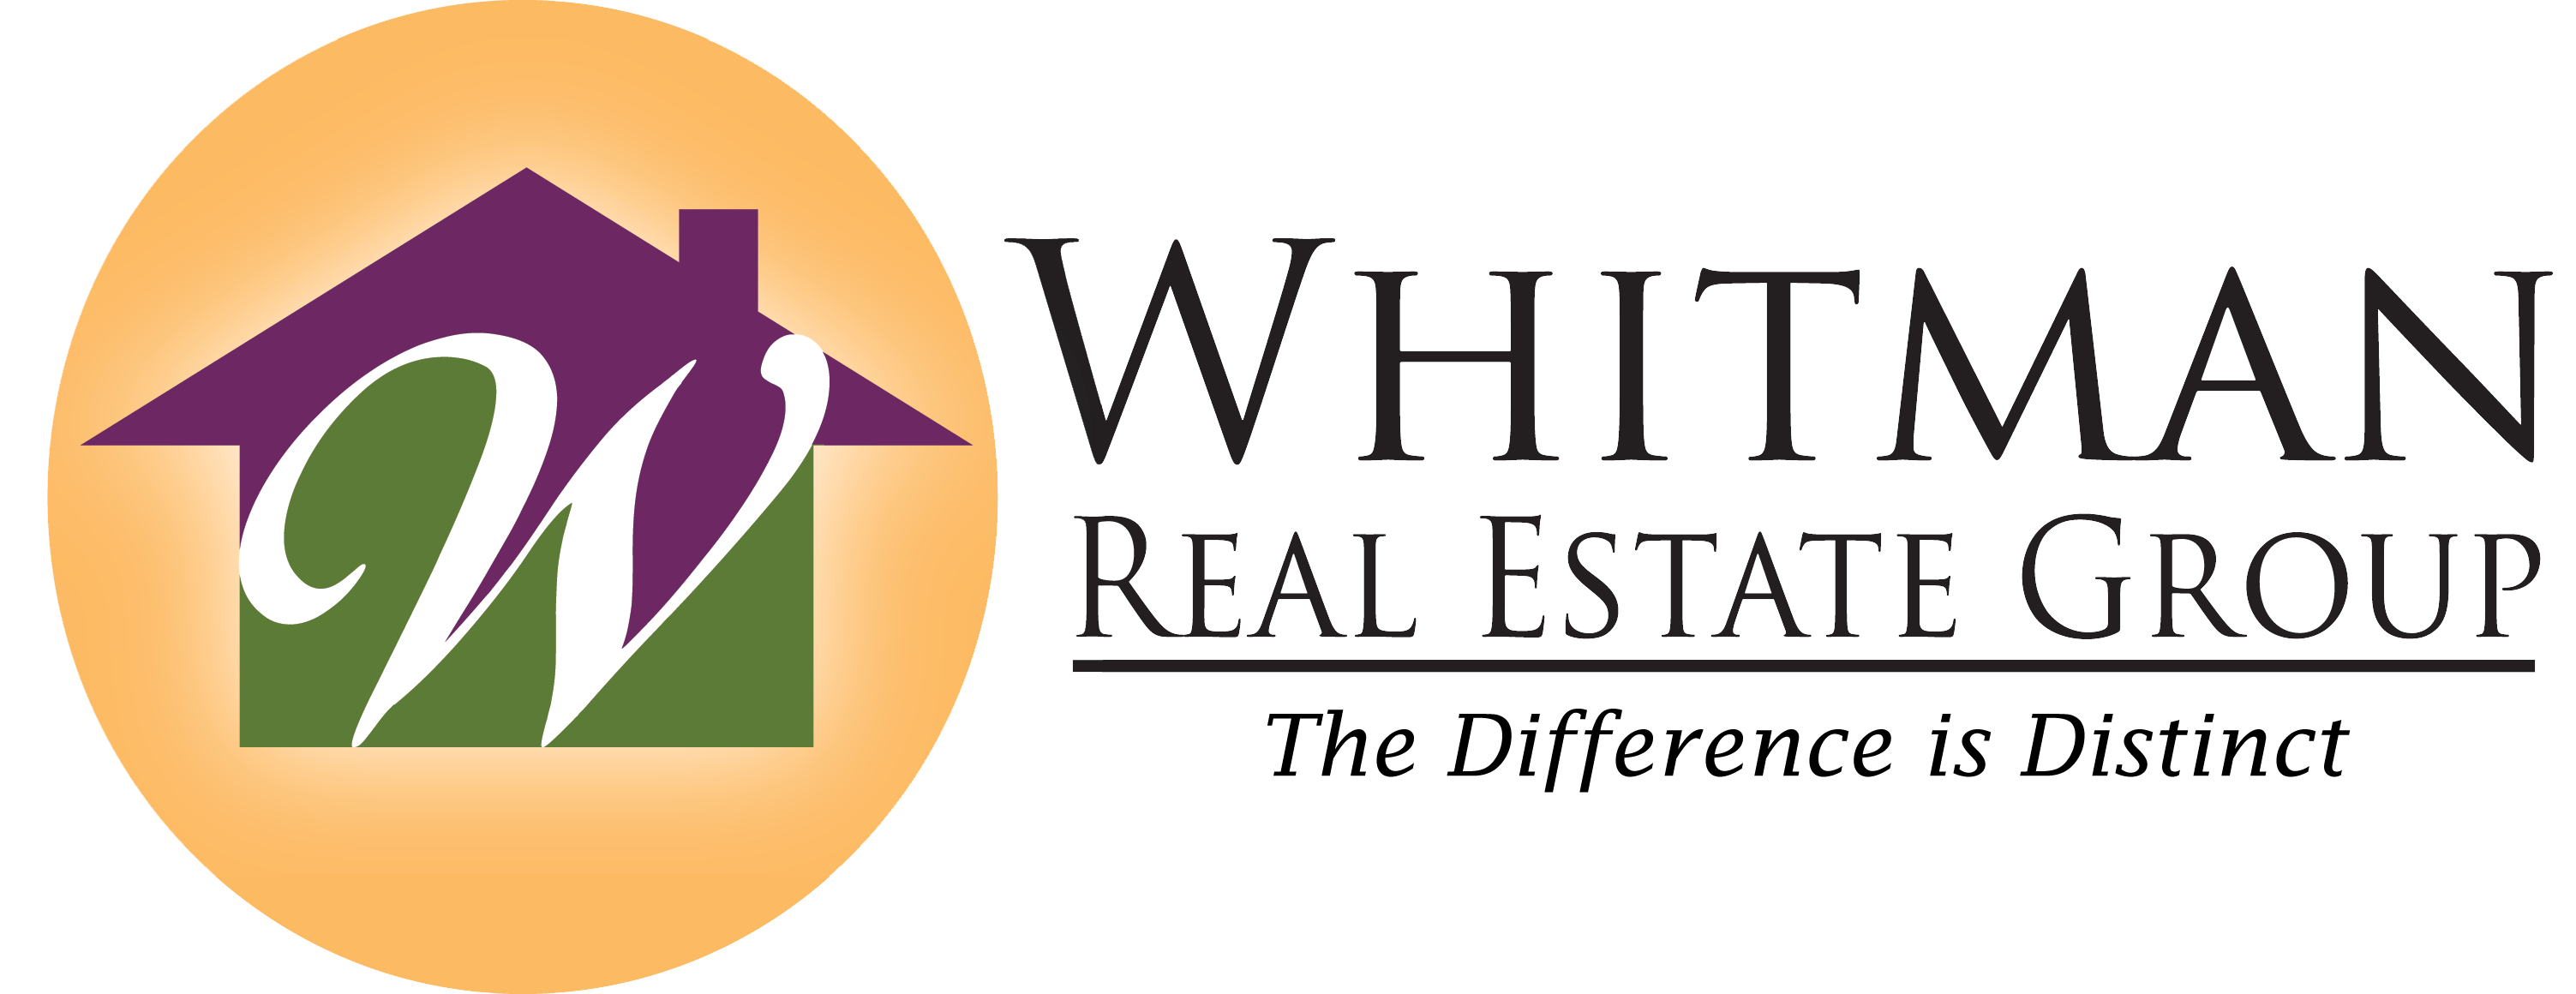 2226 Texana Way Richmond TX - Whitman Real Estate Group